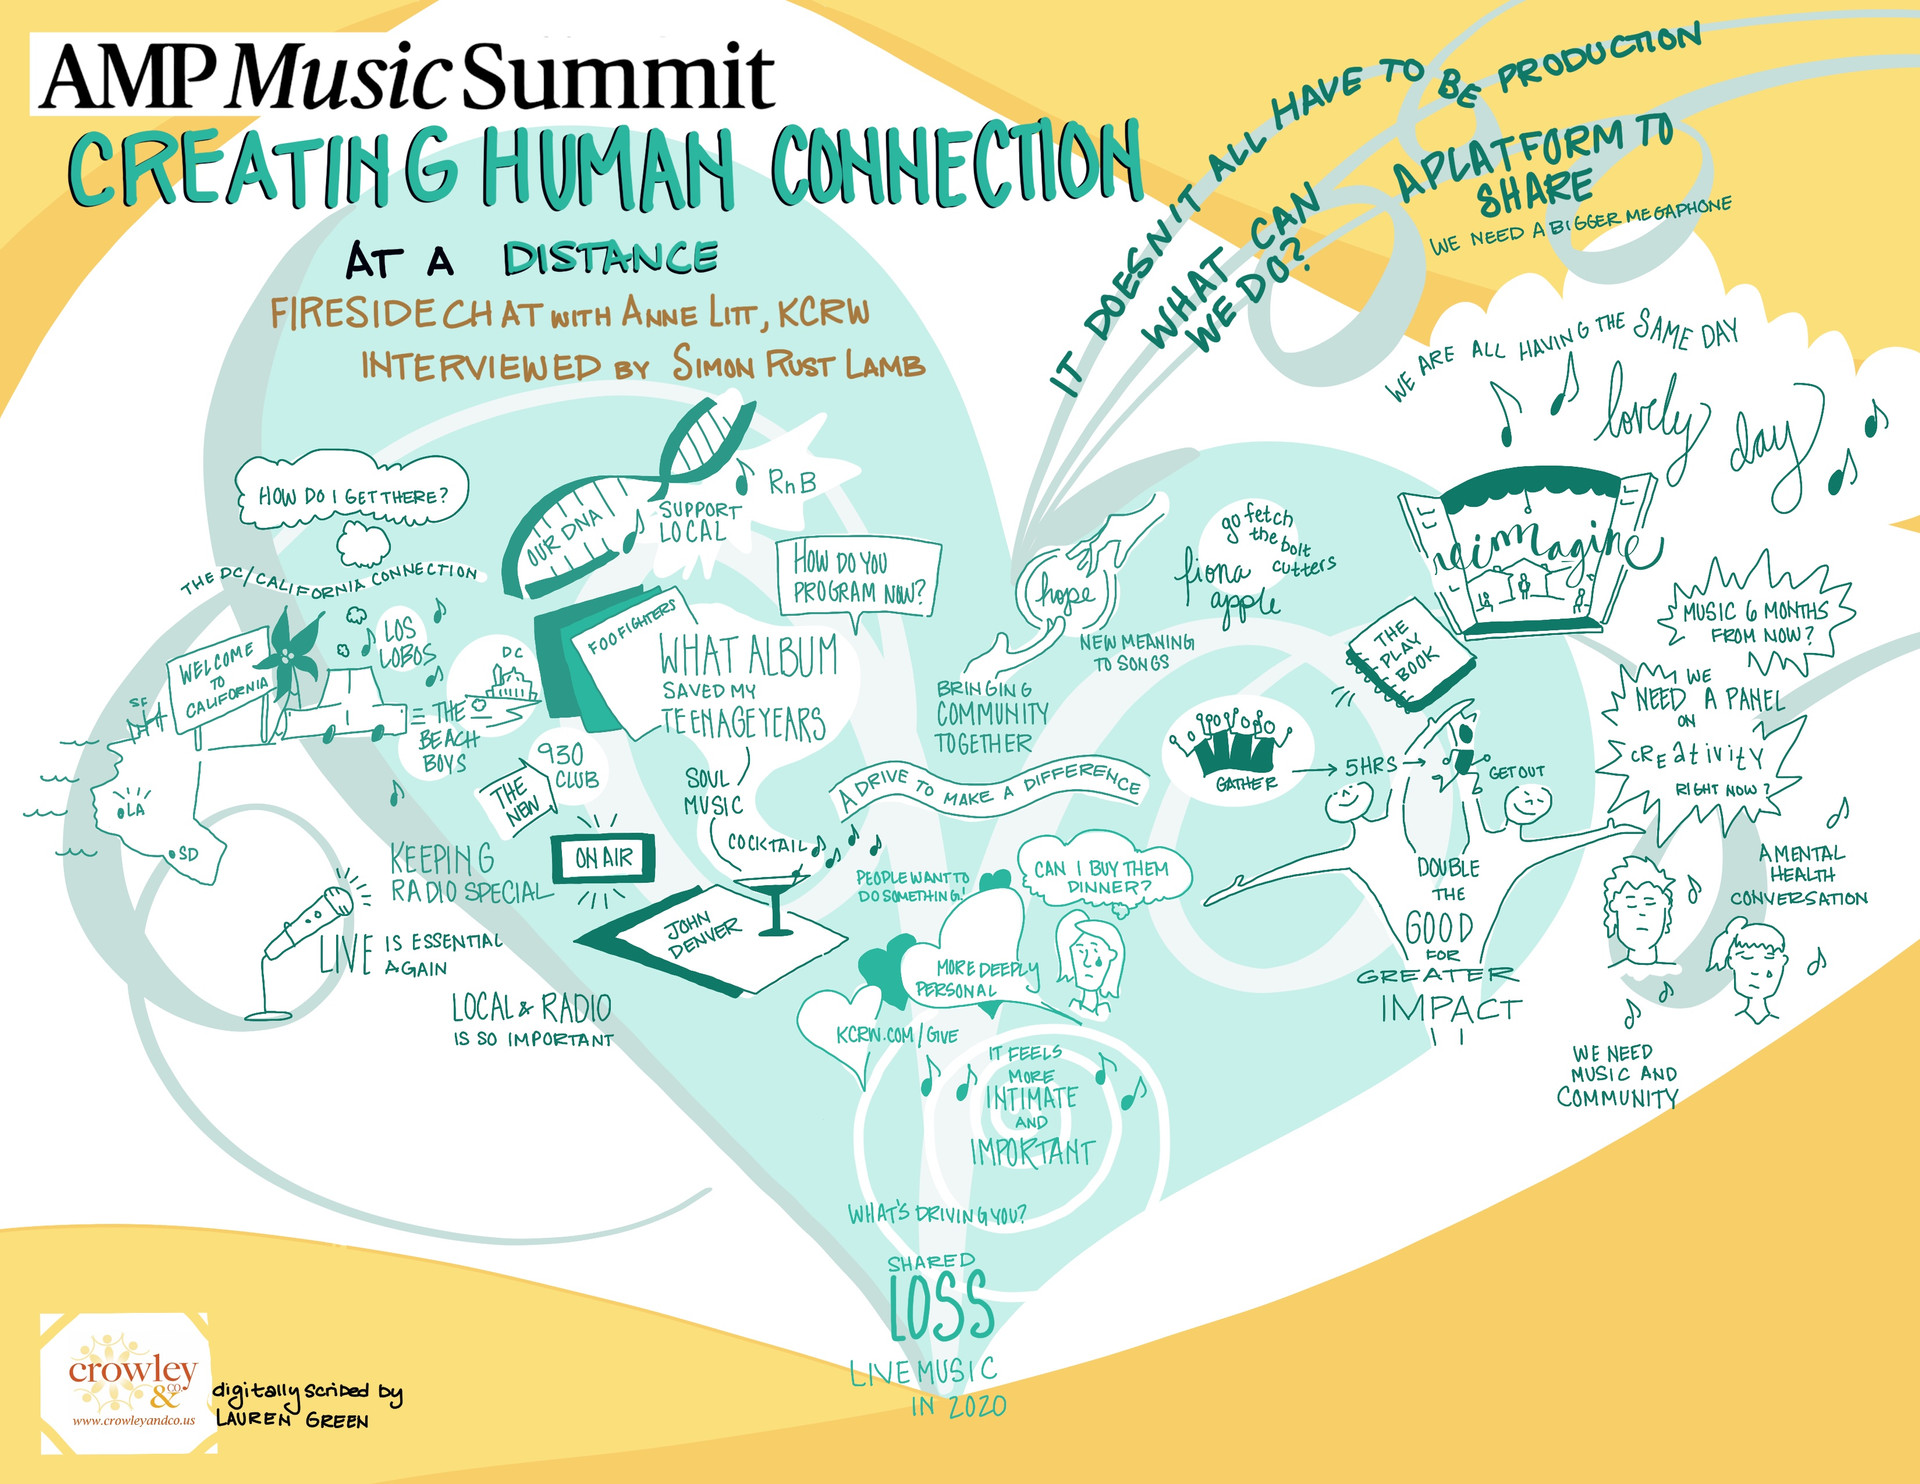 AMP Music Summit